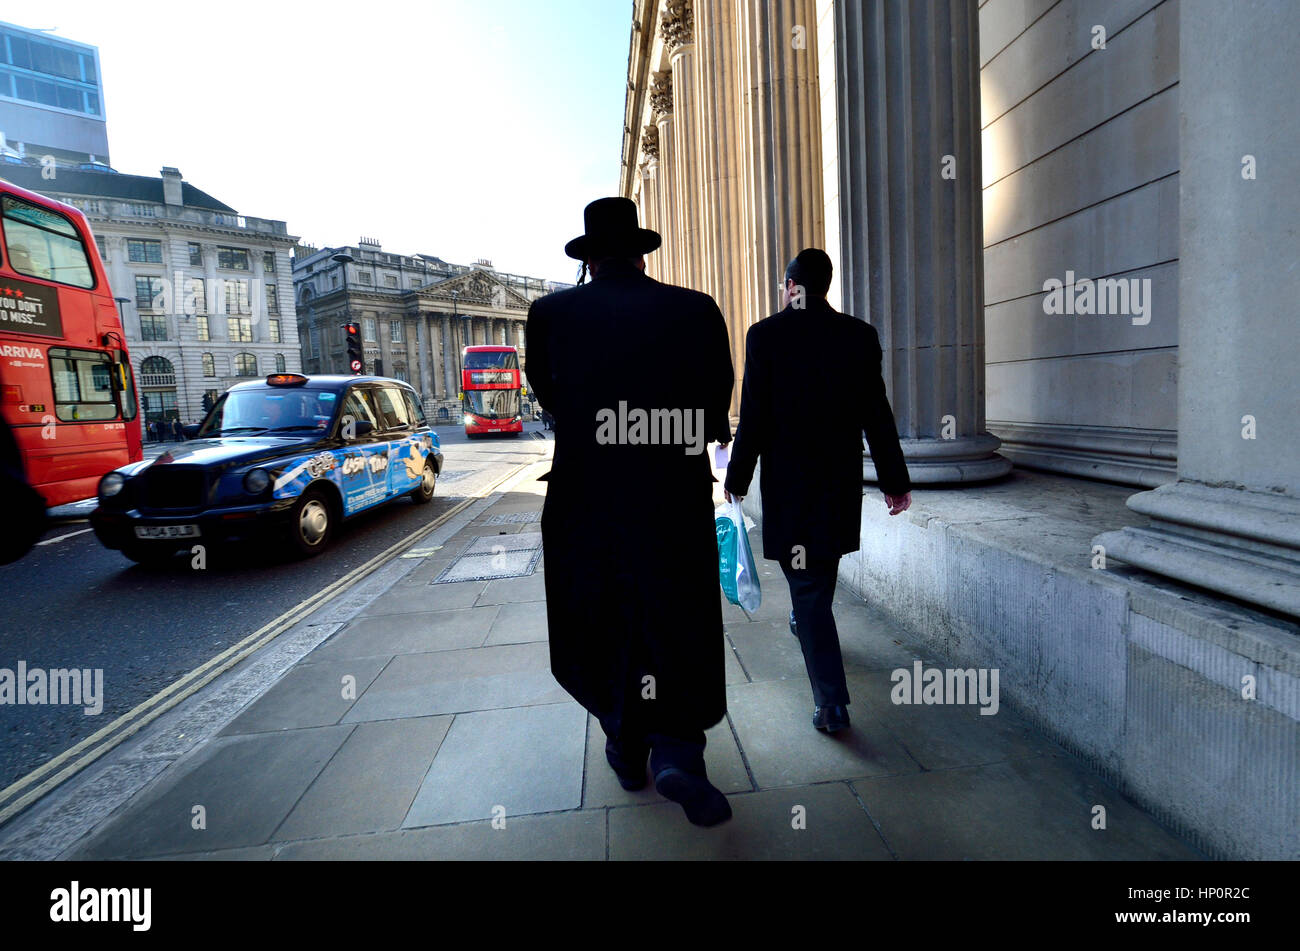 London, England, UK. Two Jewish men walking past the Bank of England - Stock Image